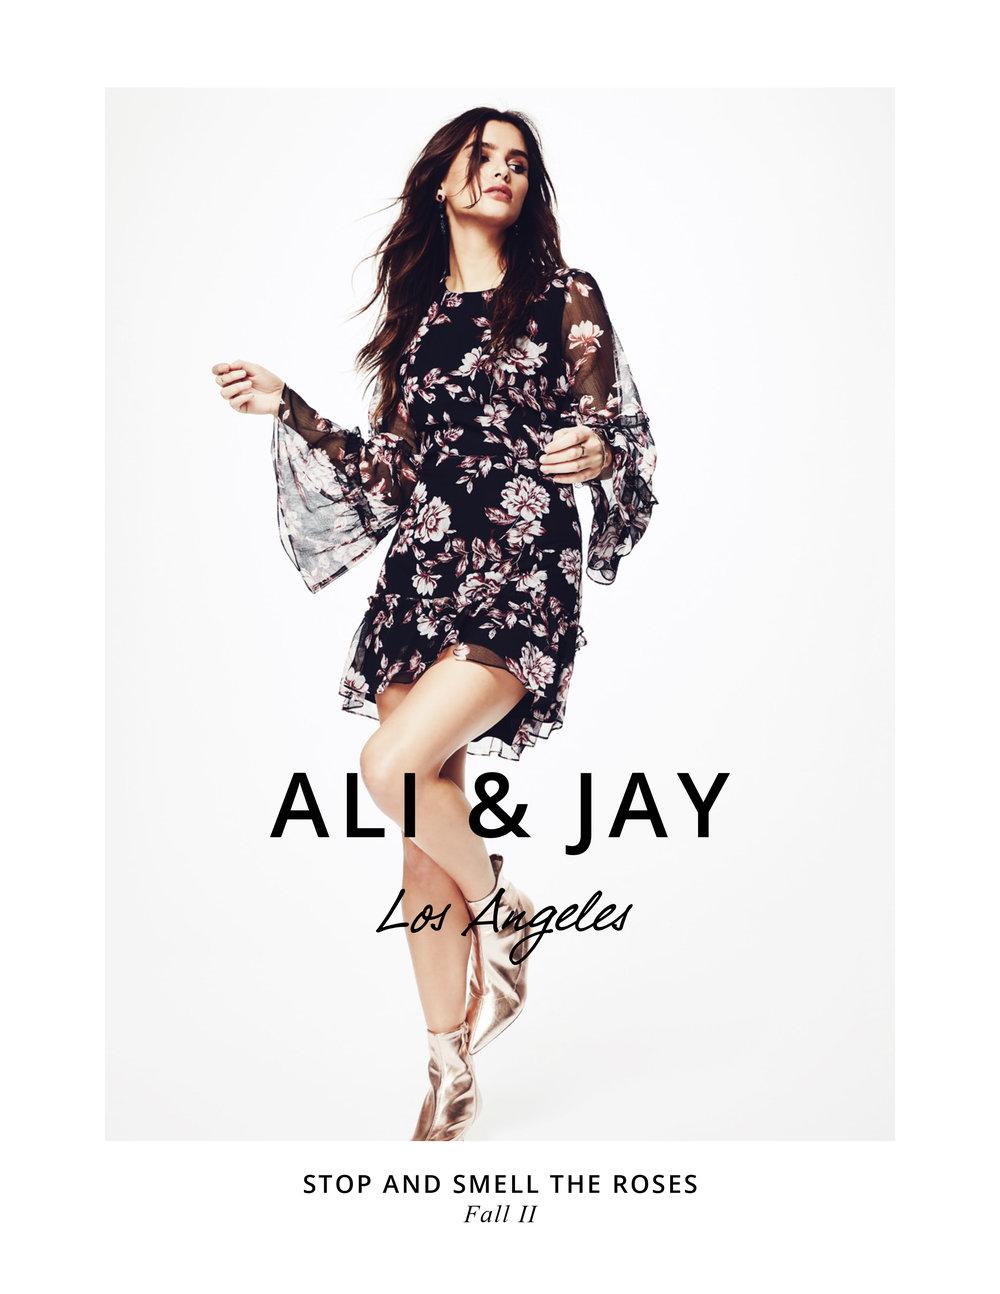 ALI & JAY